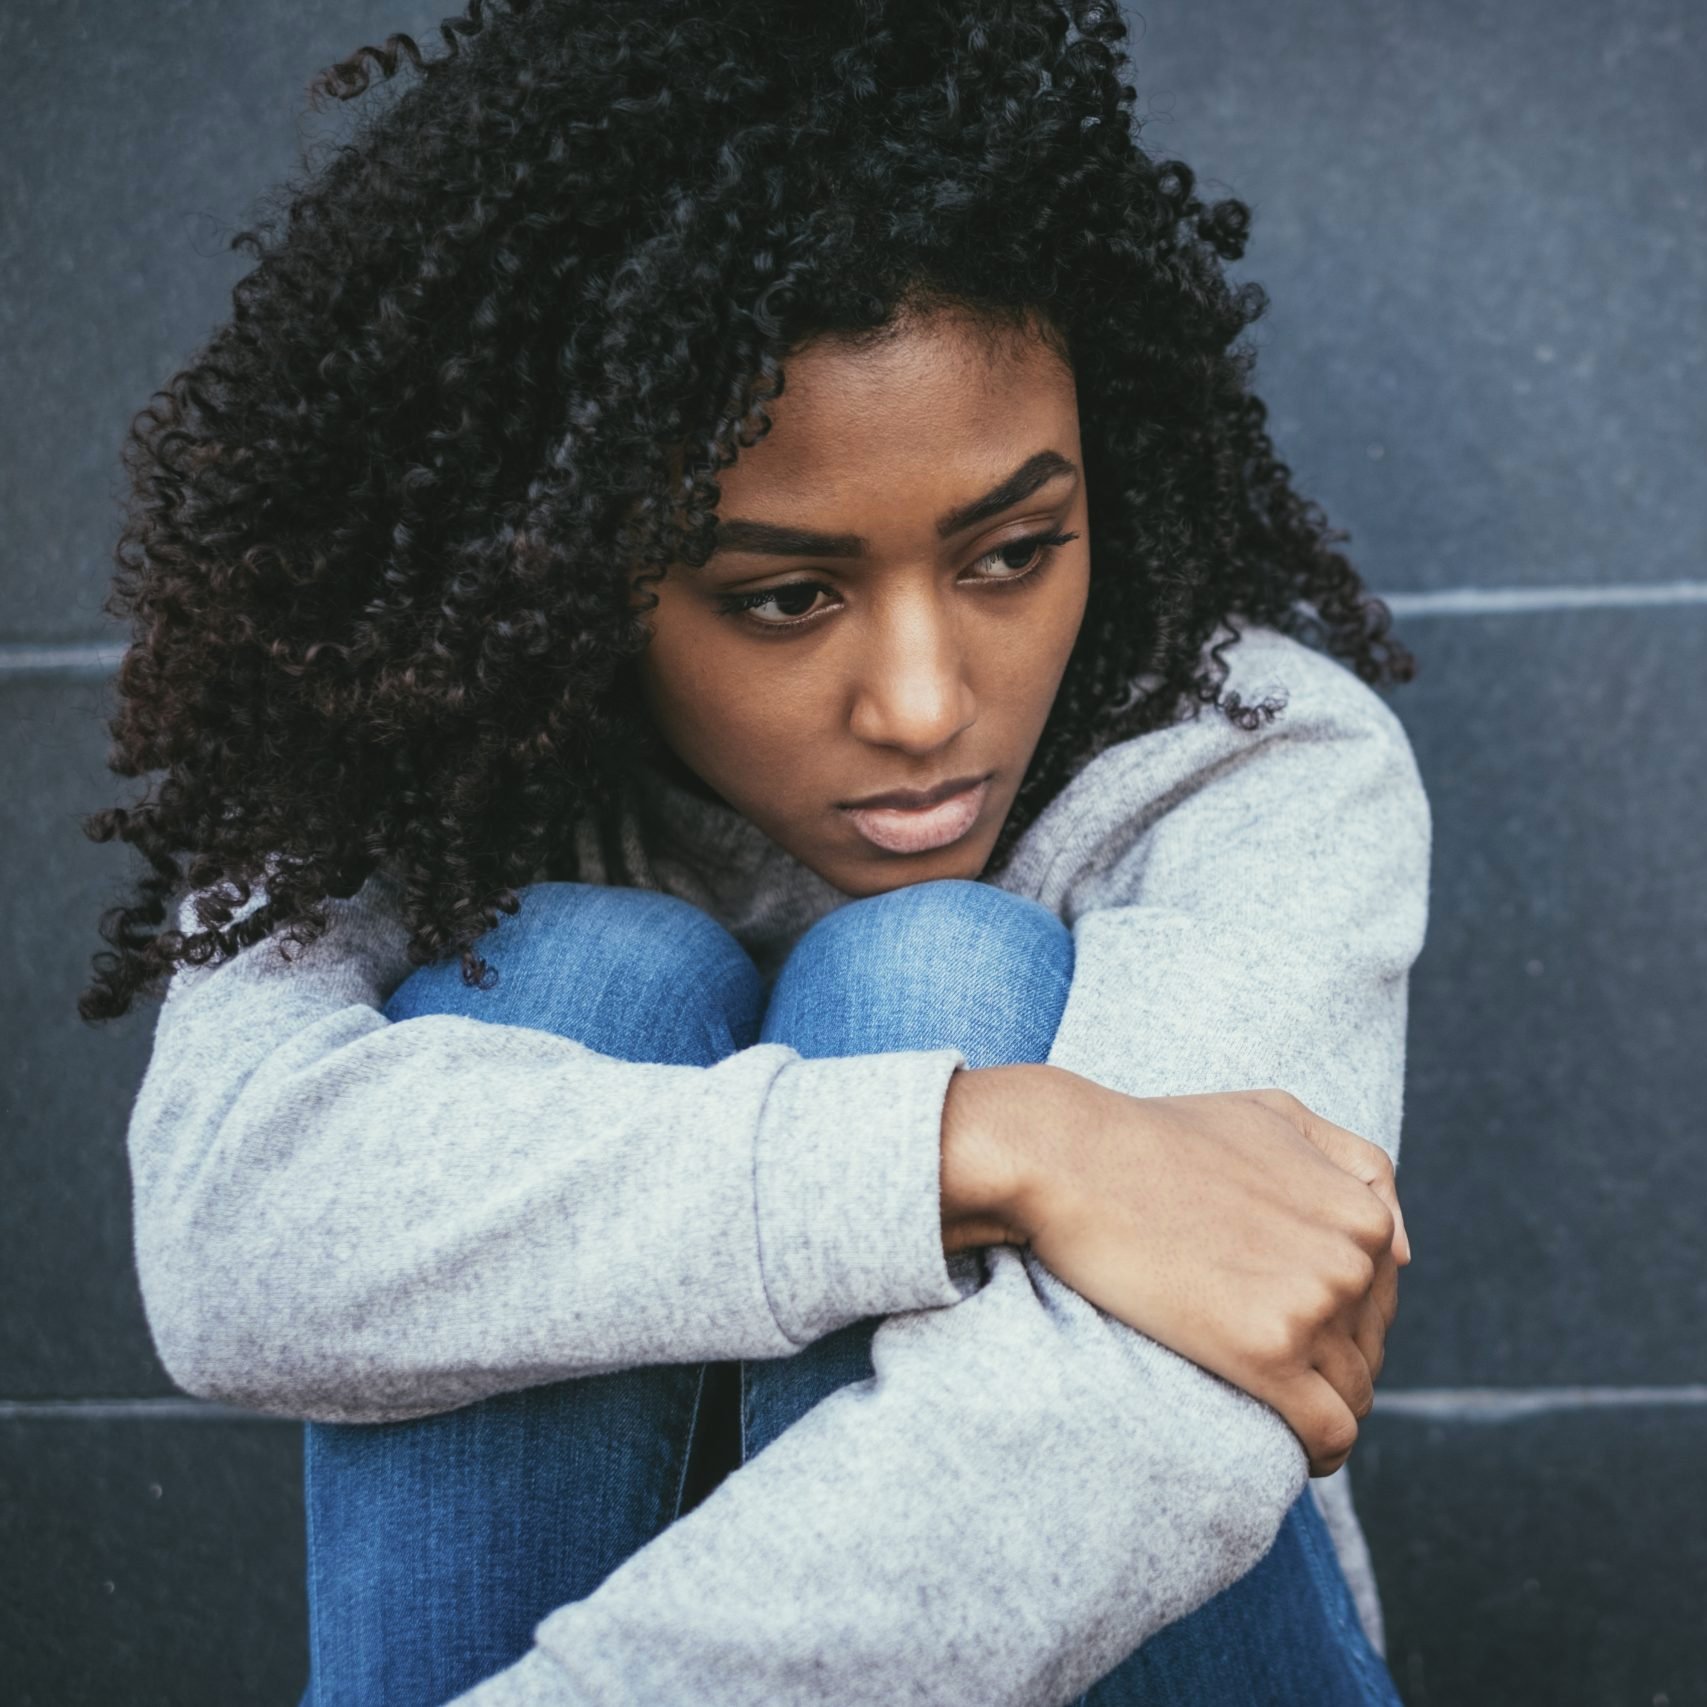 Black Mental Health Day Image